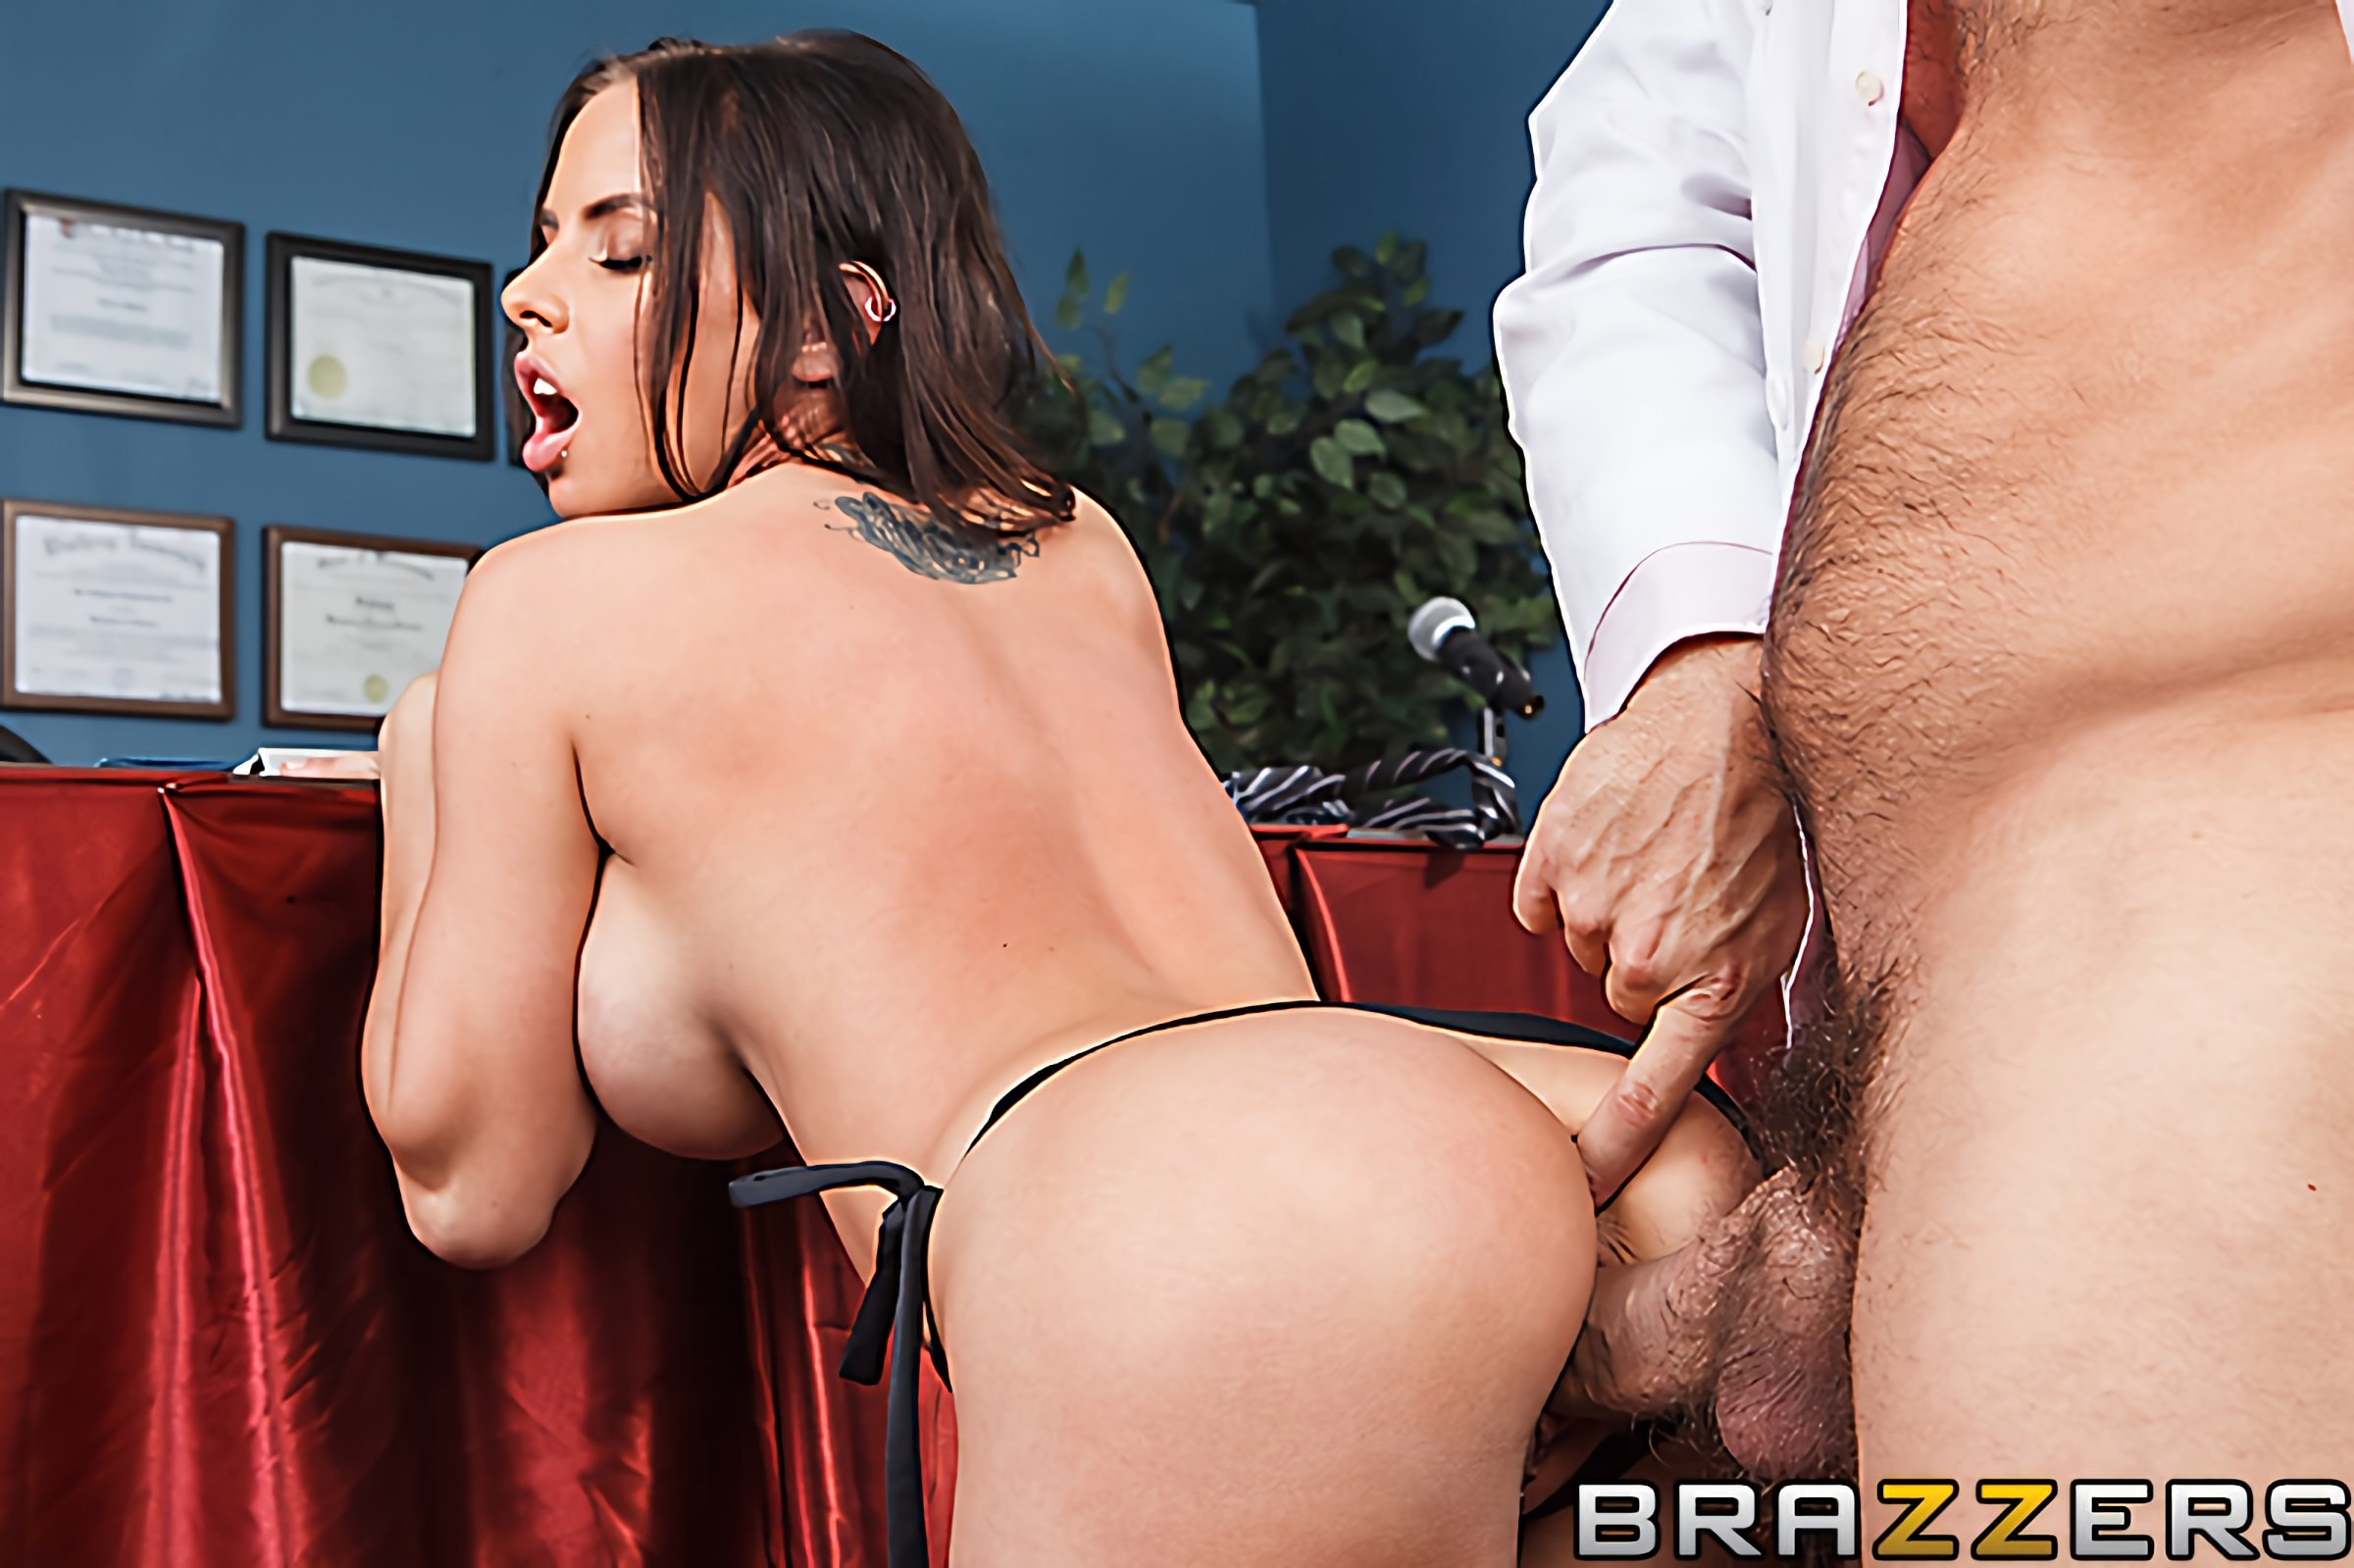 Brazzers 'License To Fuck' starring Brandy Aniston (Photo 5)